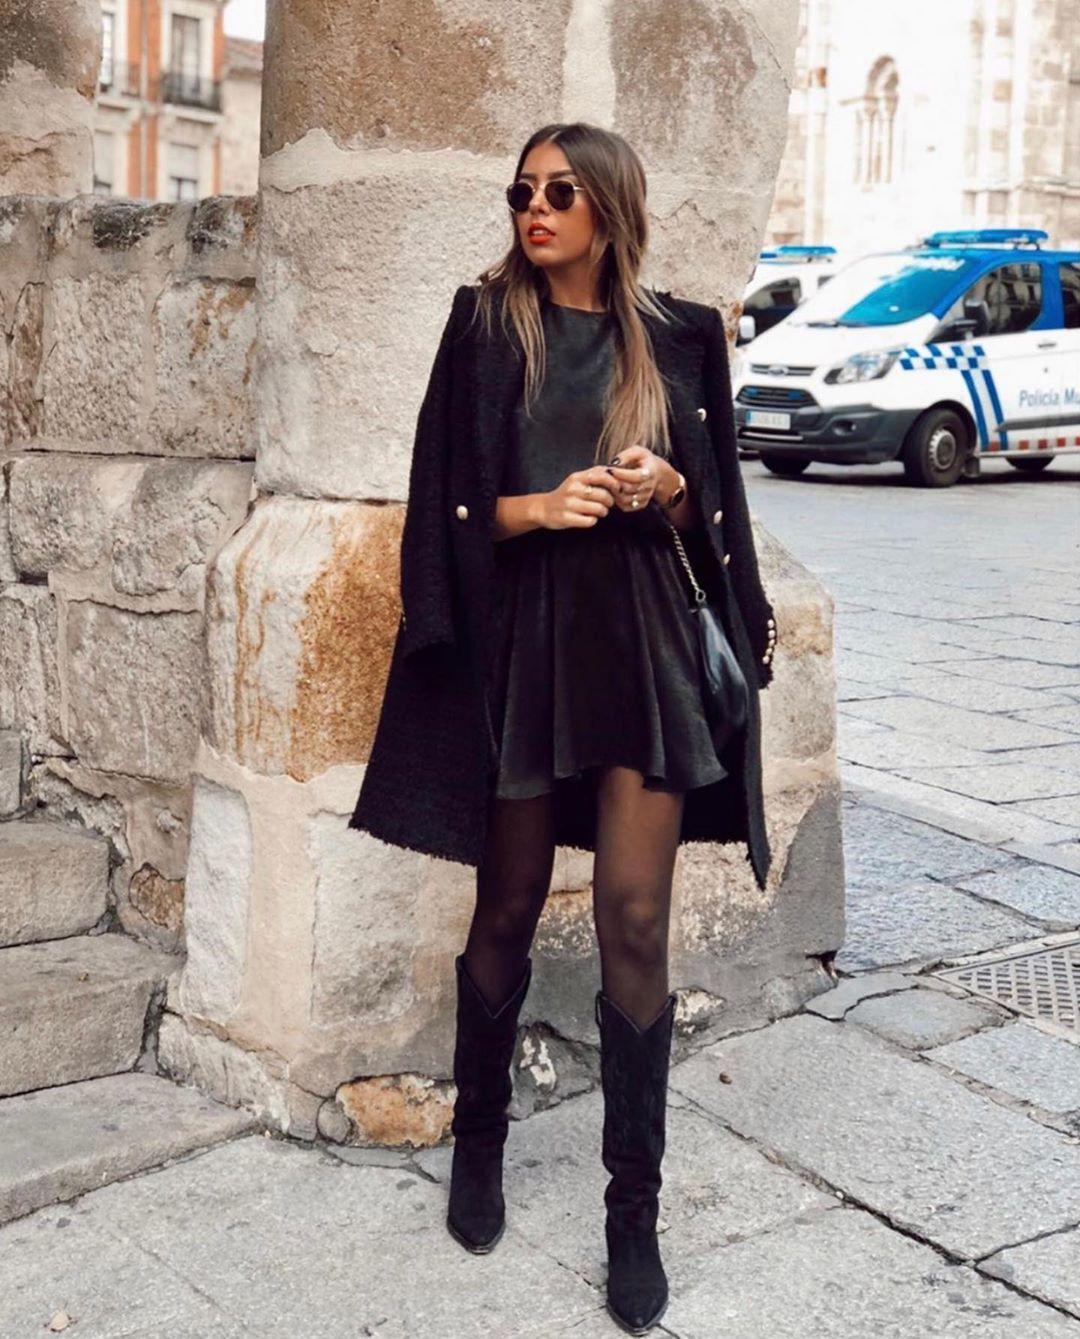 cowboy heel leather crust boots de Zara sur zaraaddiction